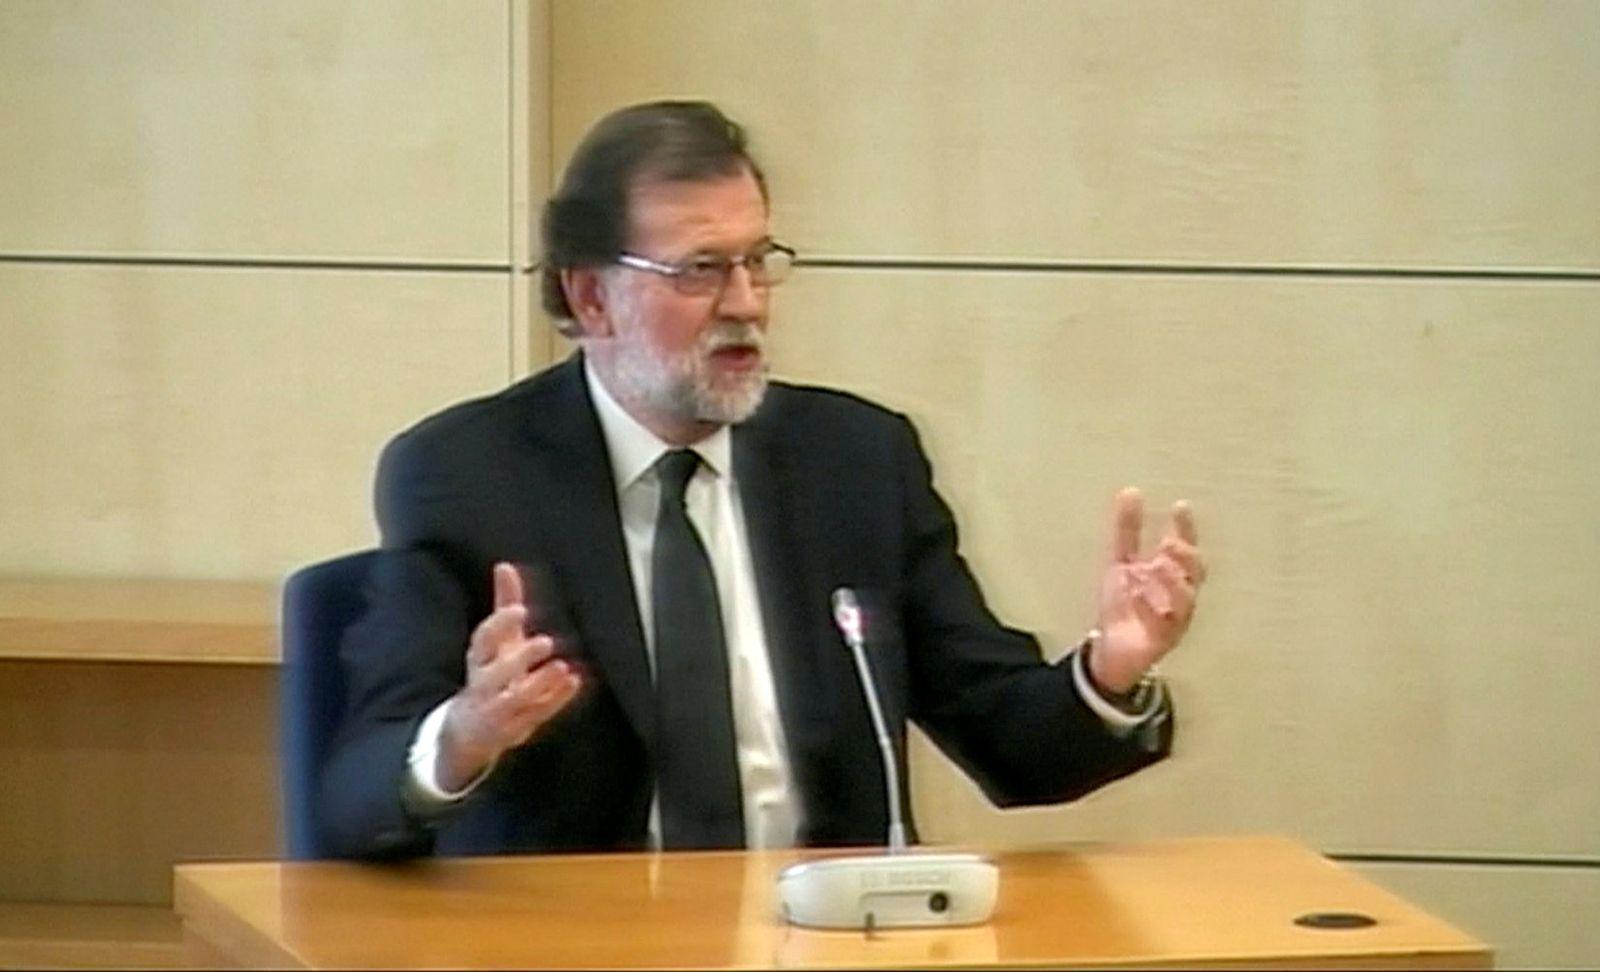 SPAIN-POLITICS/CORRUPTION